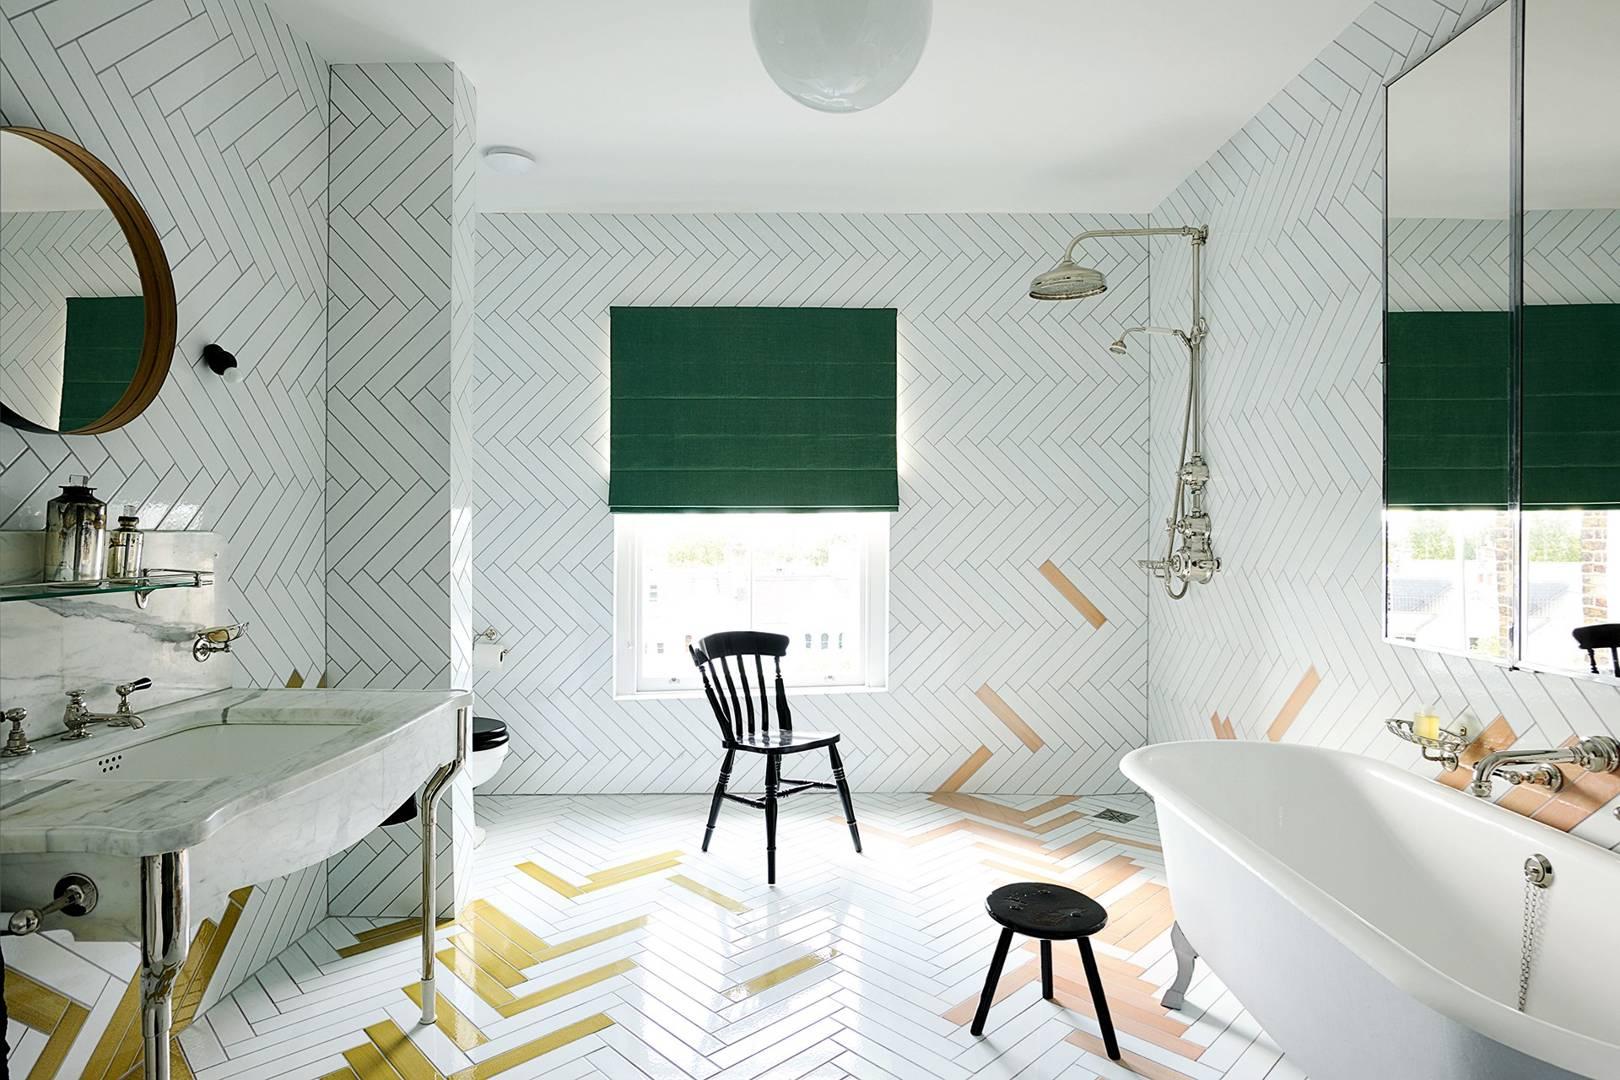 Shower & Wet Room Design | Small Bathroom Ideas | House & Garden